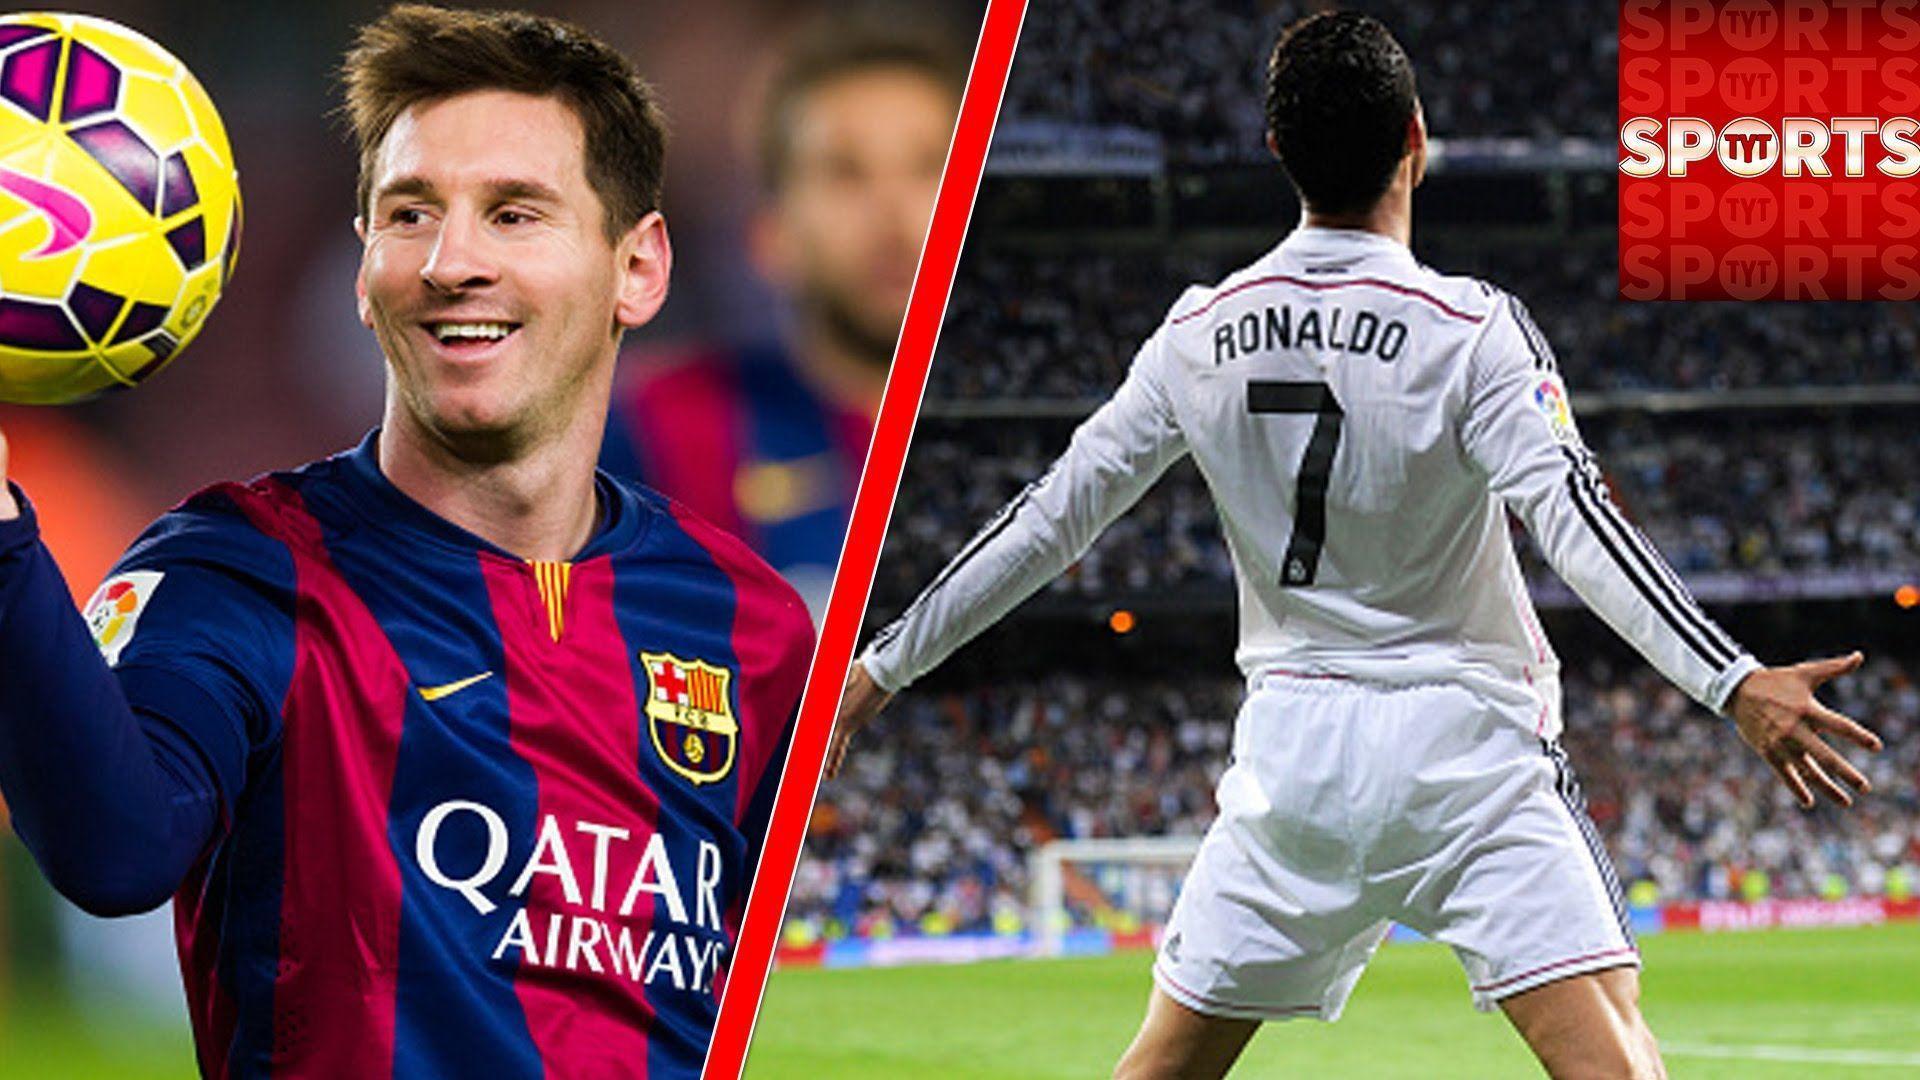 Messi Vs Ronaldo Wallpapers 2016 Hd Wallpaper Cave